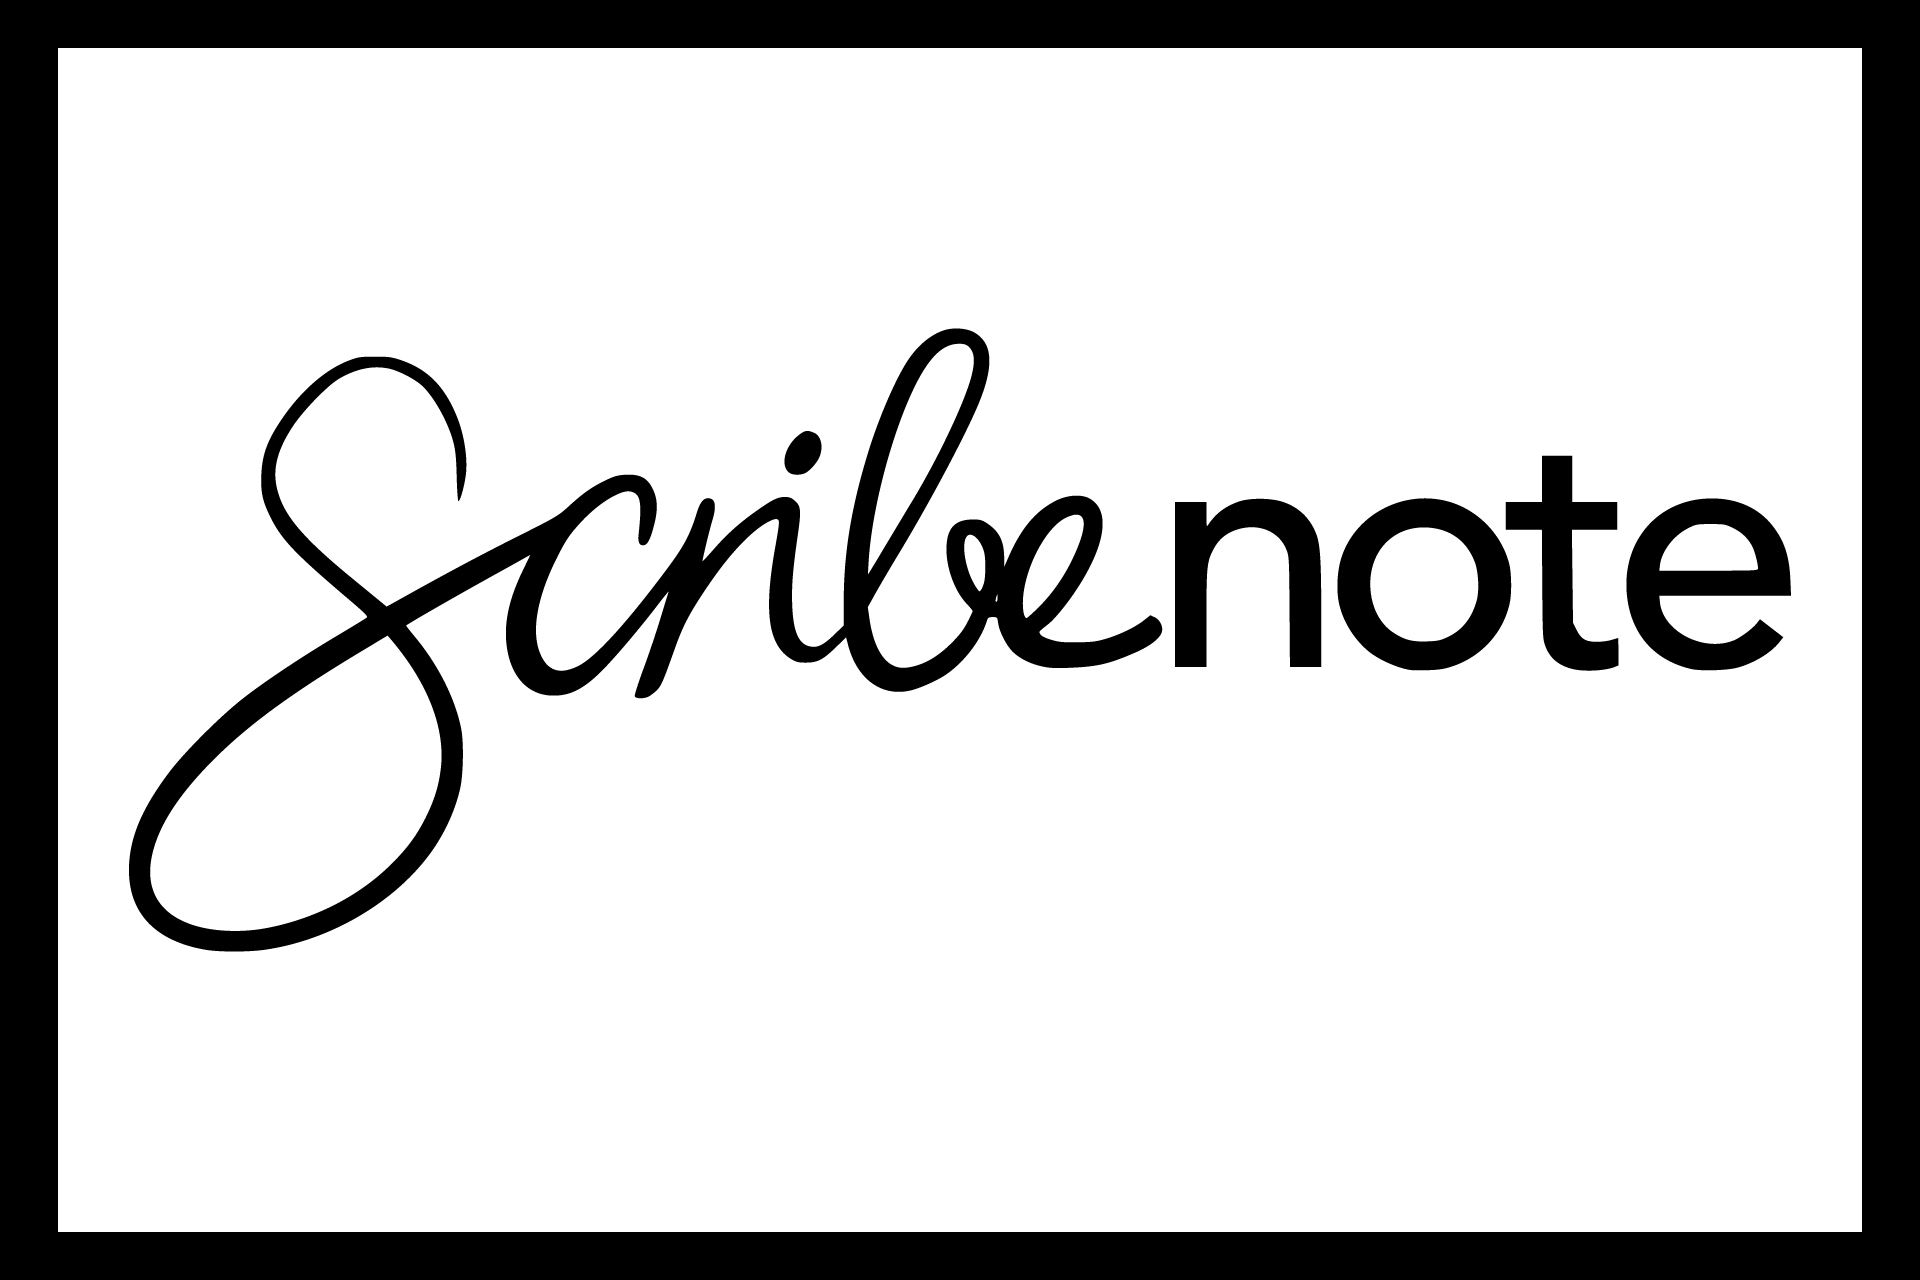 Scribenote logo